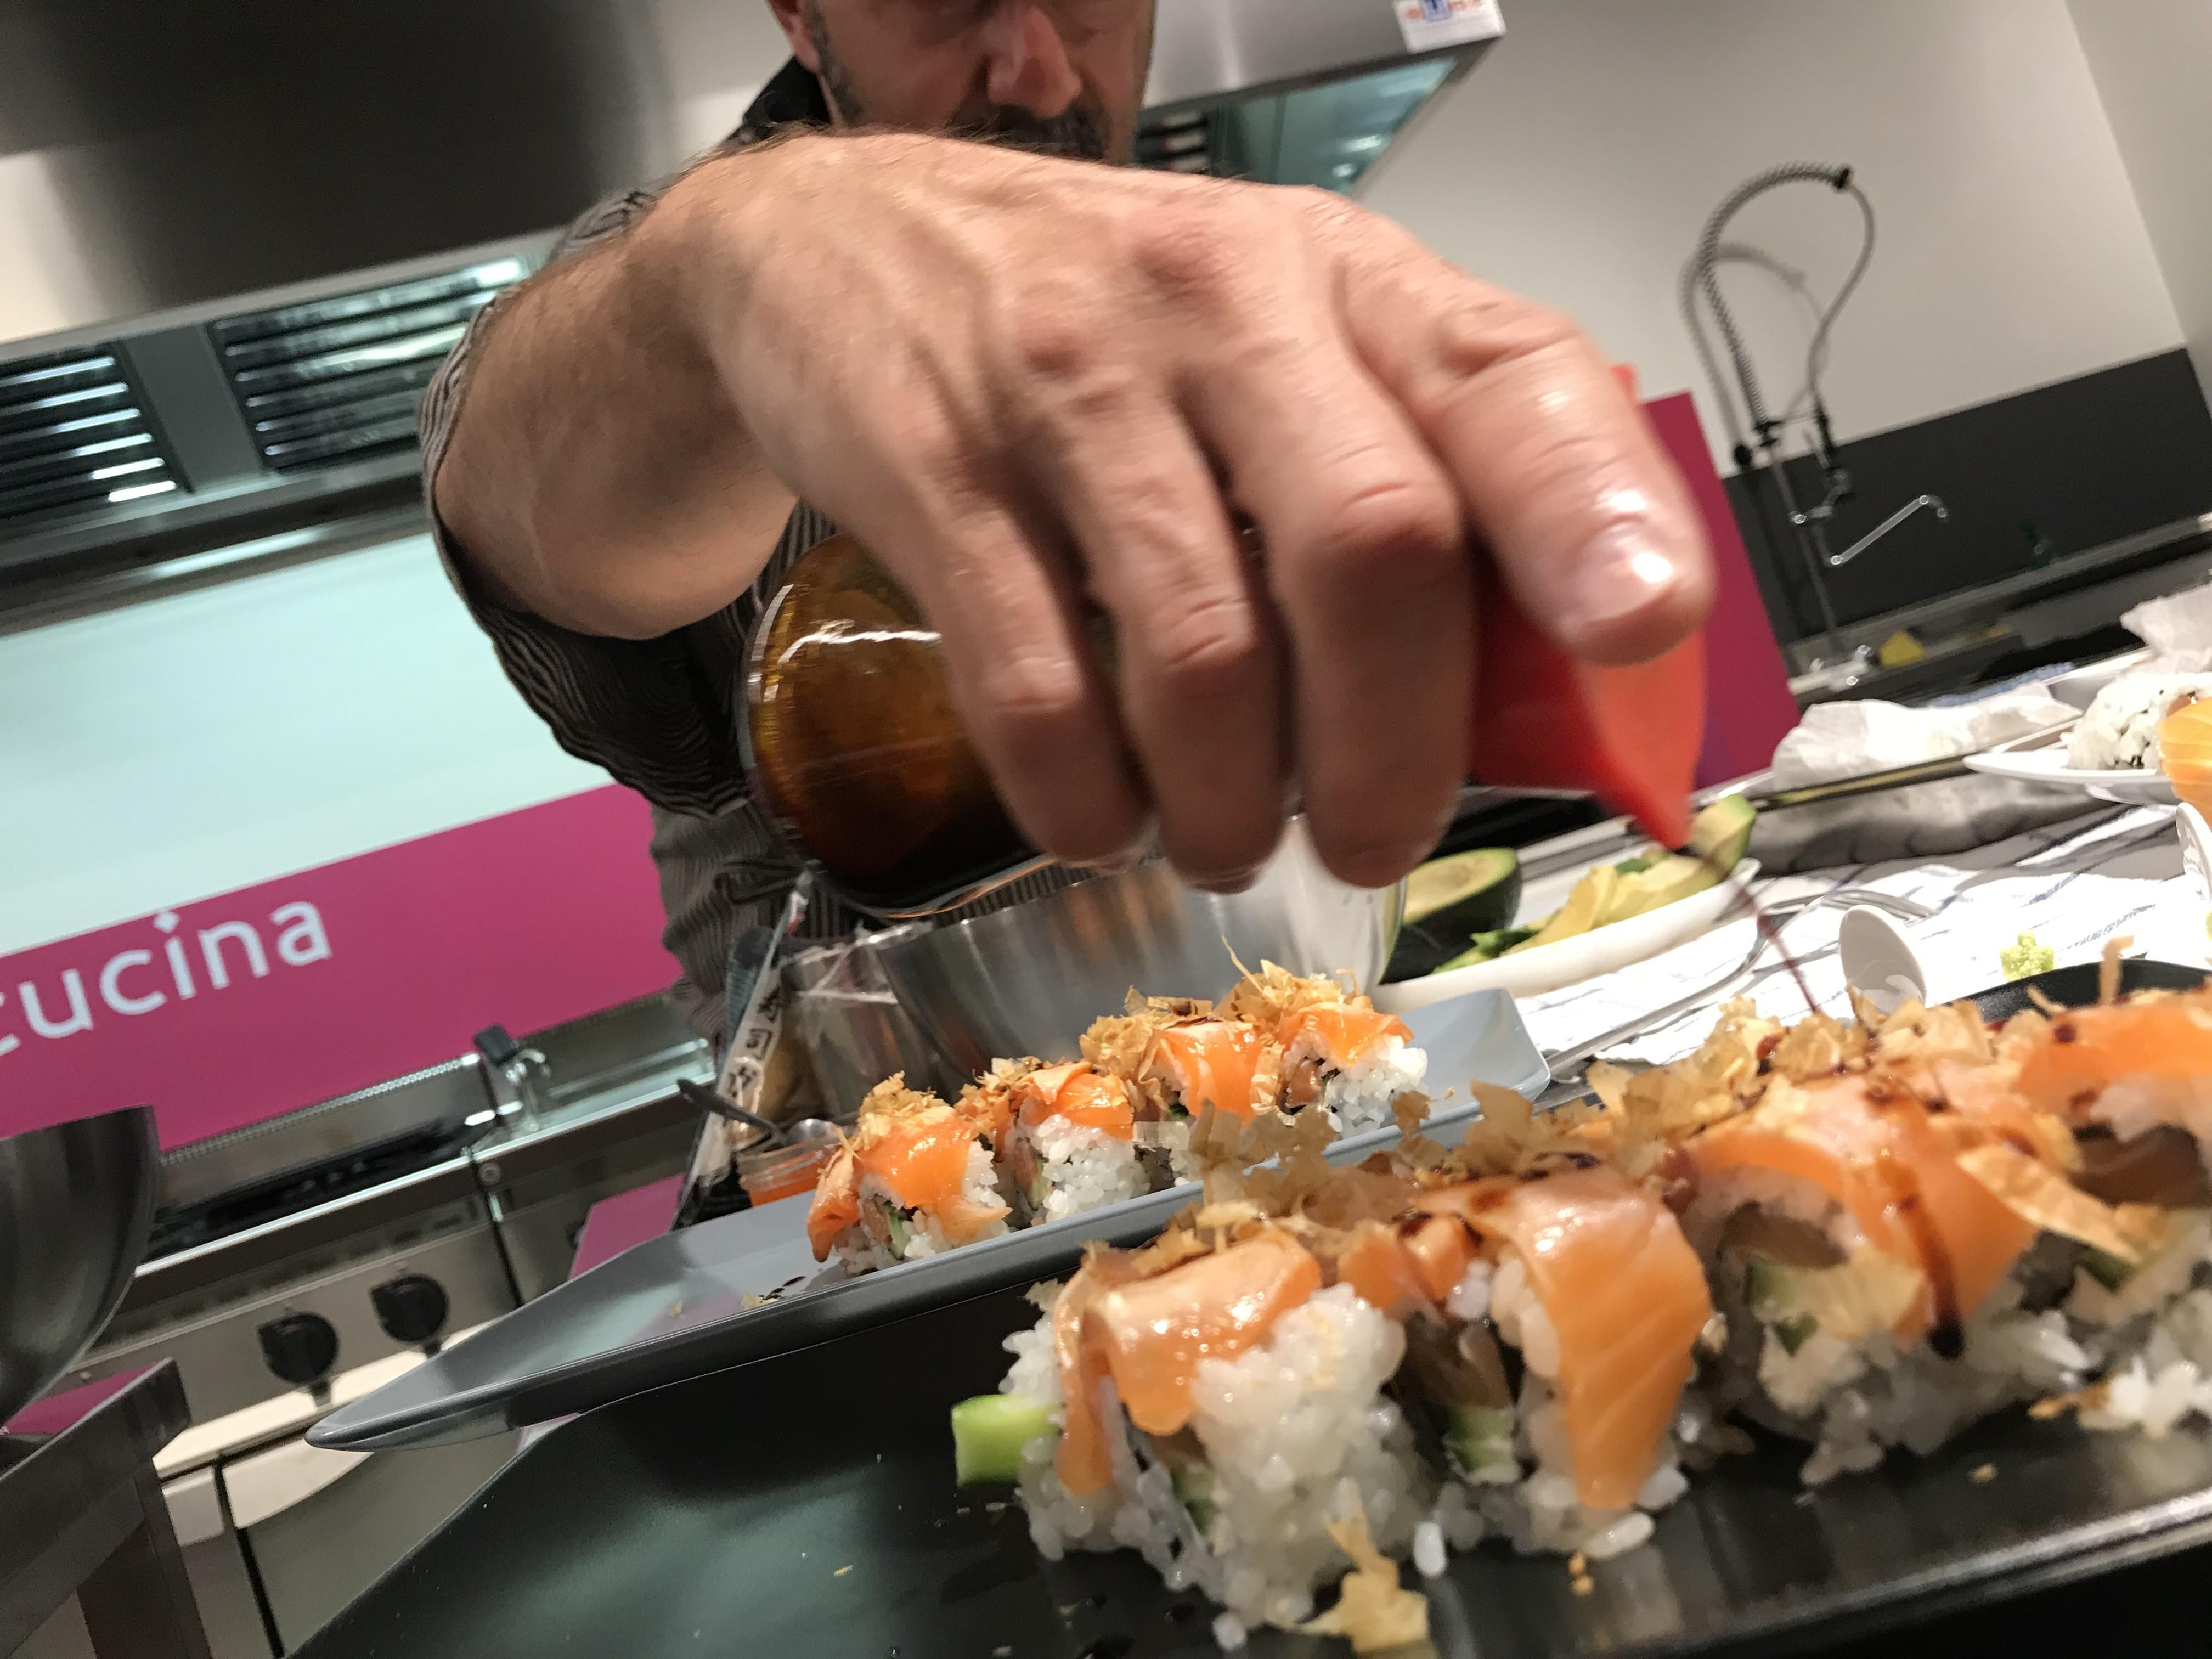 Ottoincucina corso di cucina giapponese a bologna - Corso di cucina bologna ...